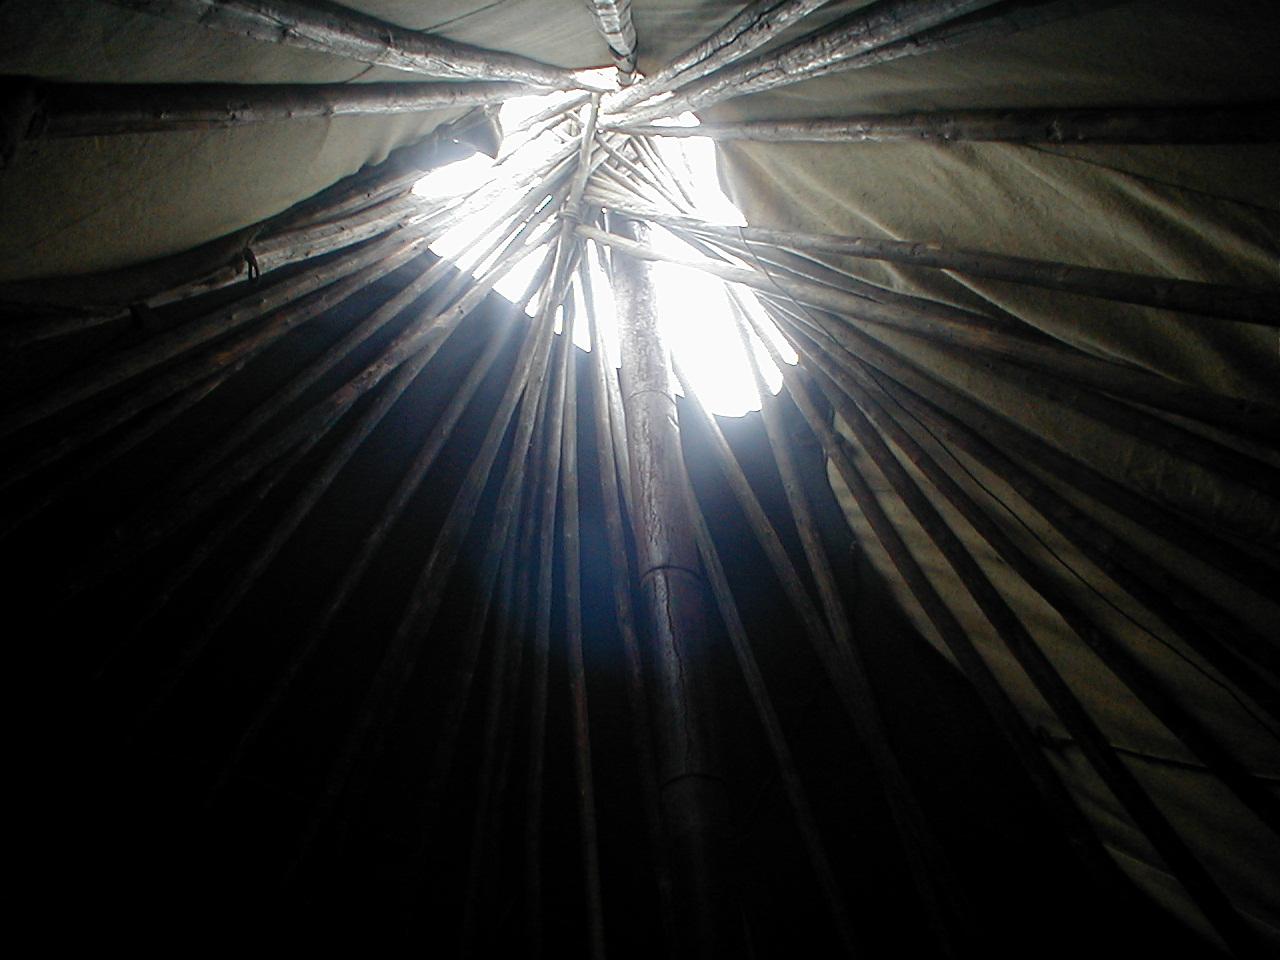 Дырка на потолке чума